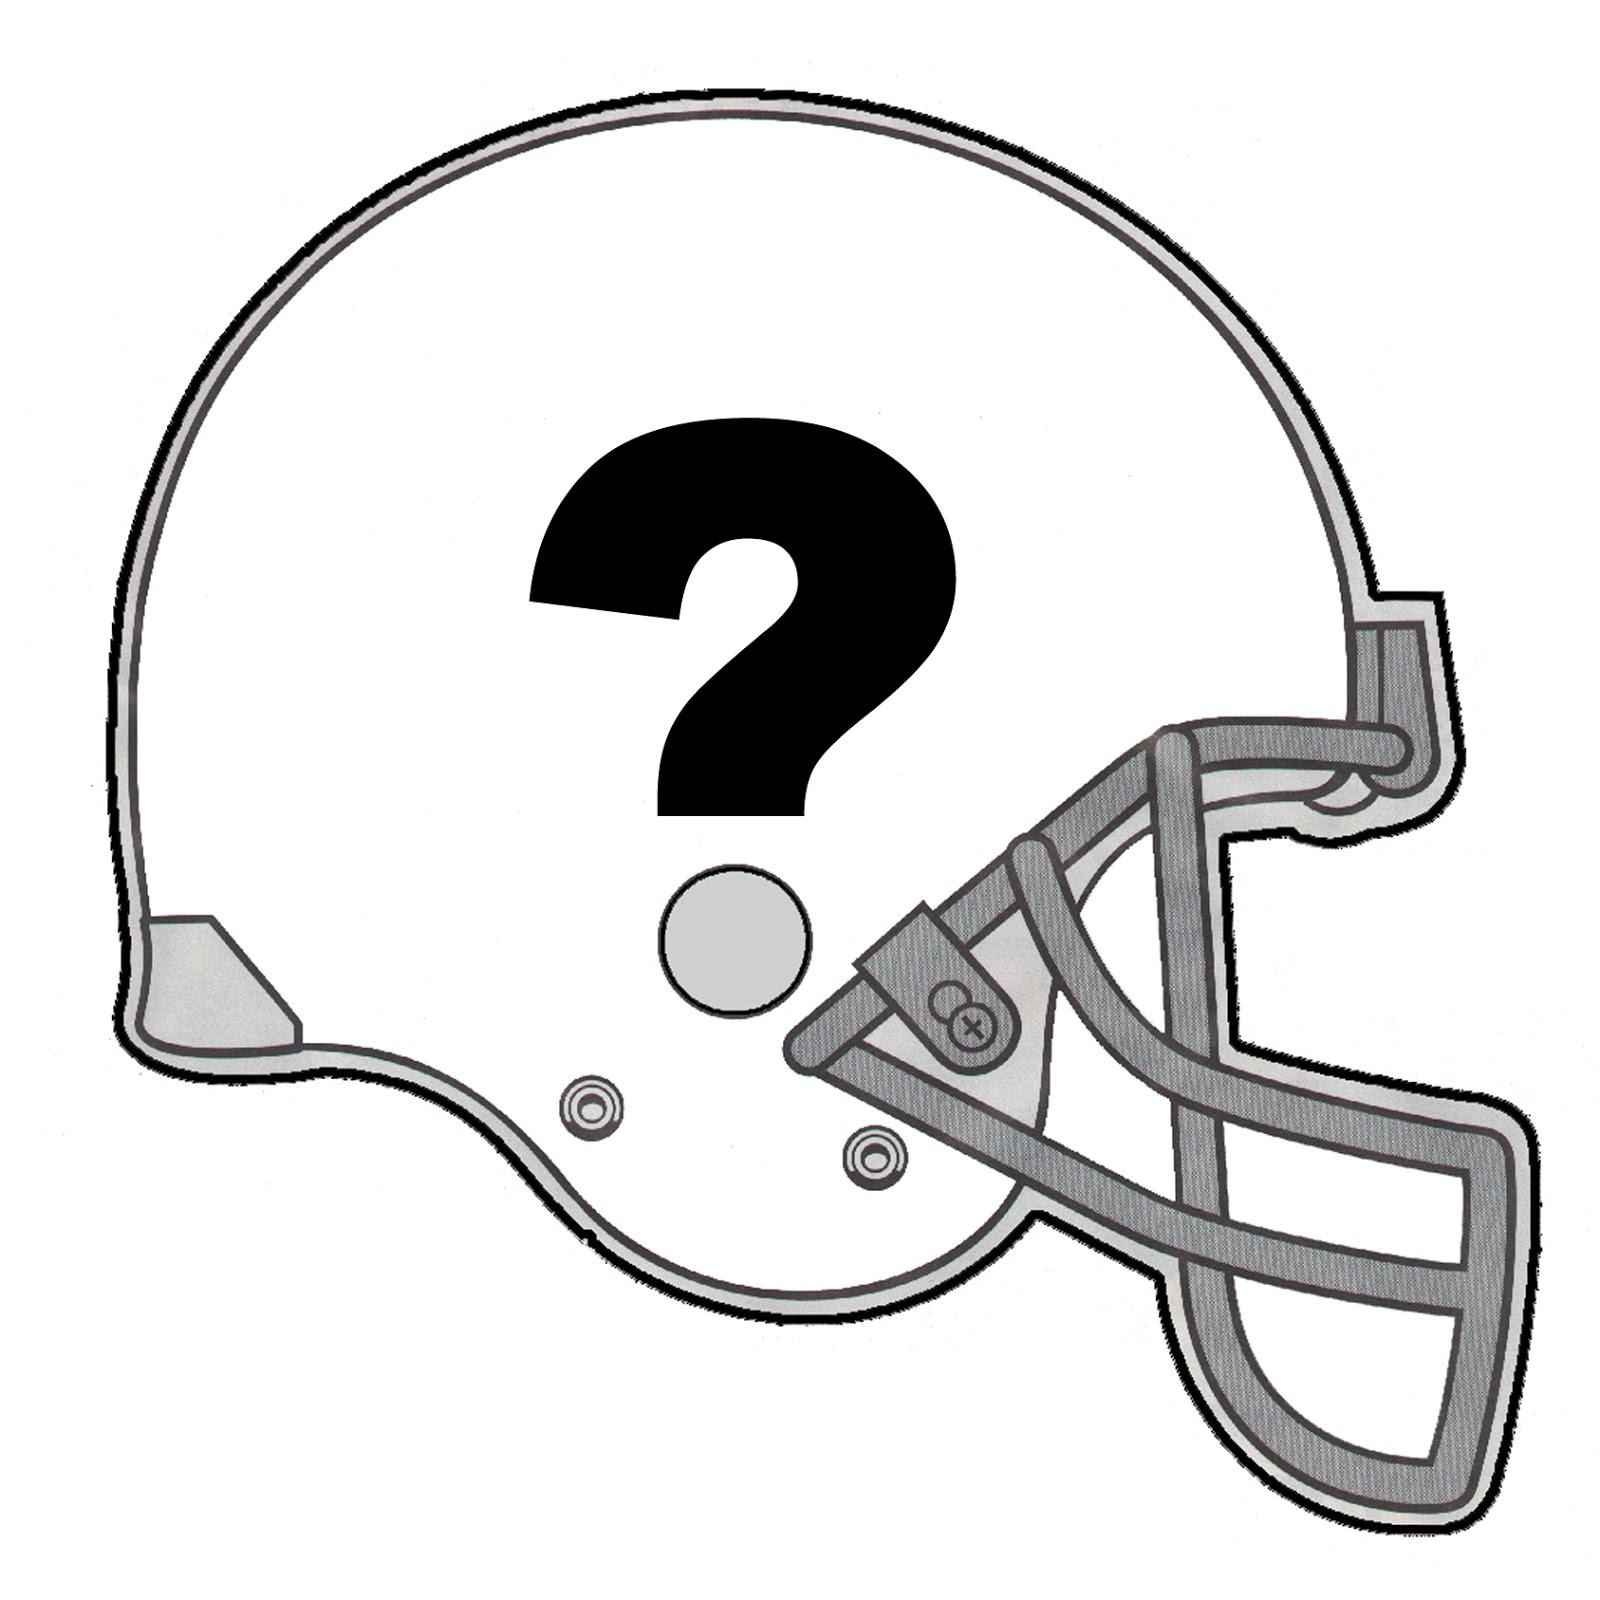 Football helmet front drawing